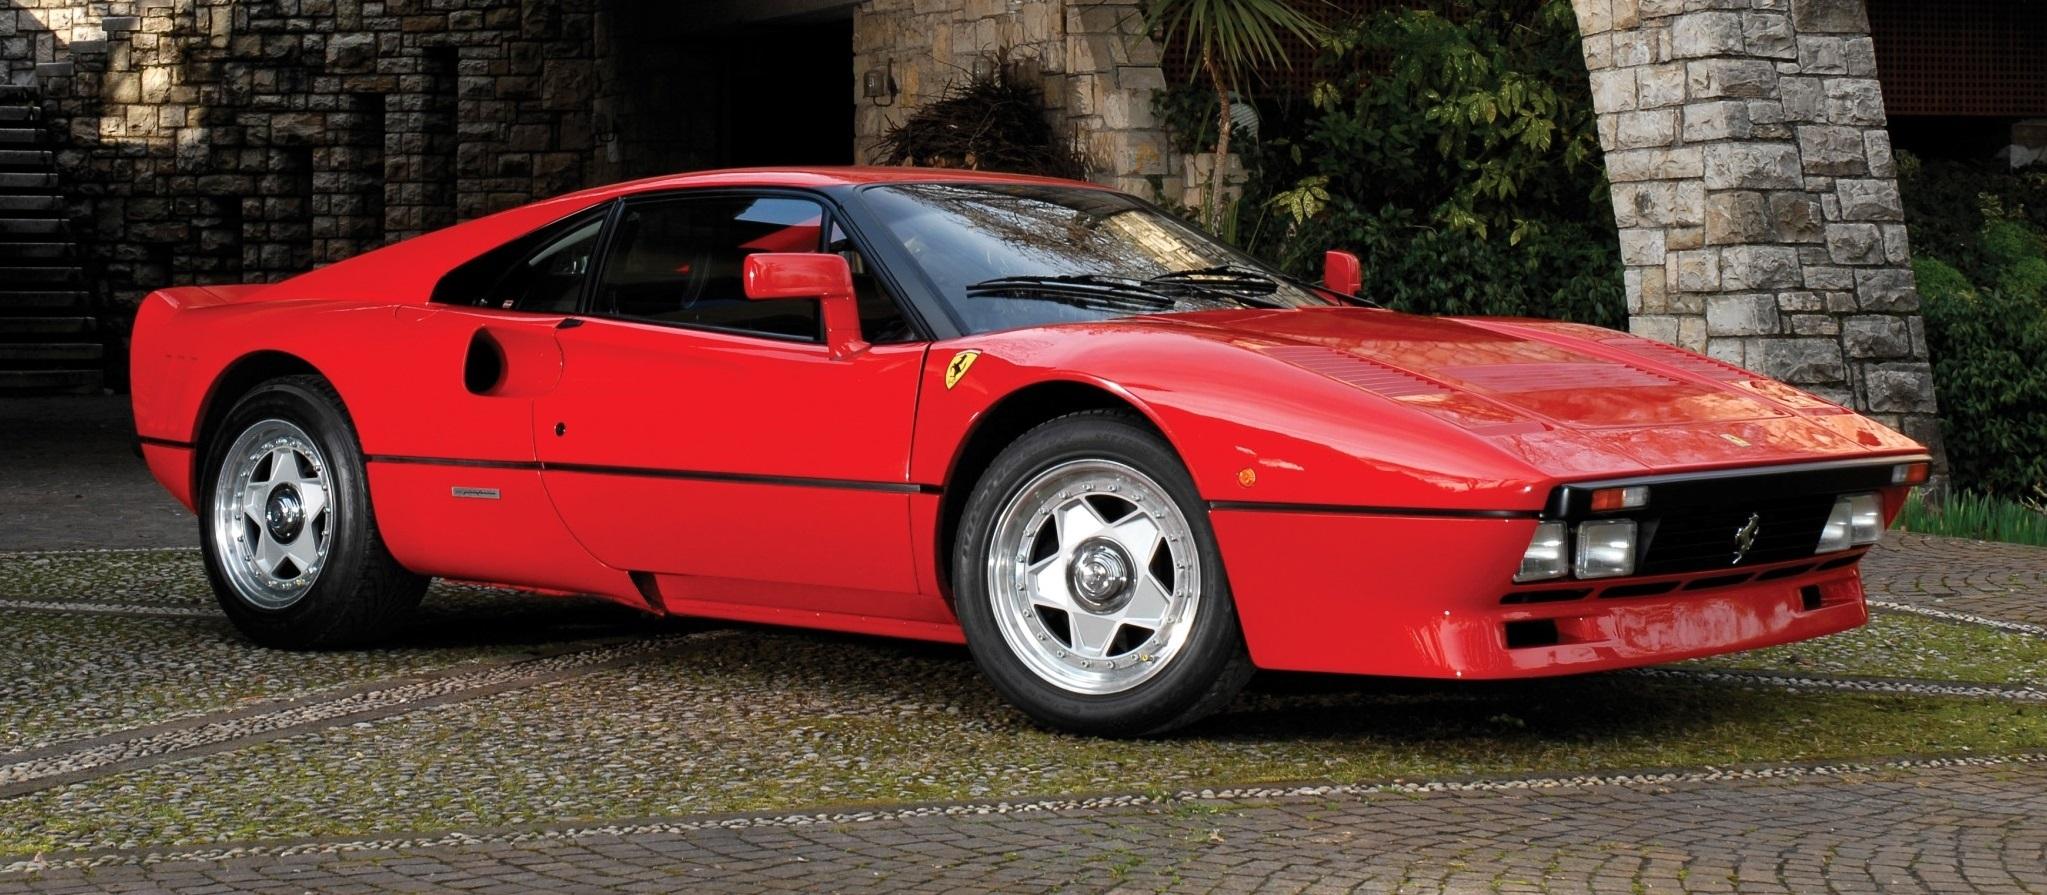 The gorgeous 288 GTO was Ferrari's first serious turbocharged car.